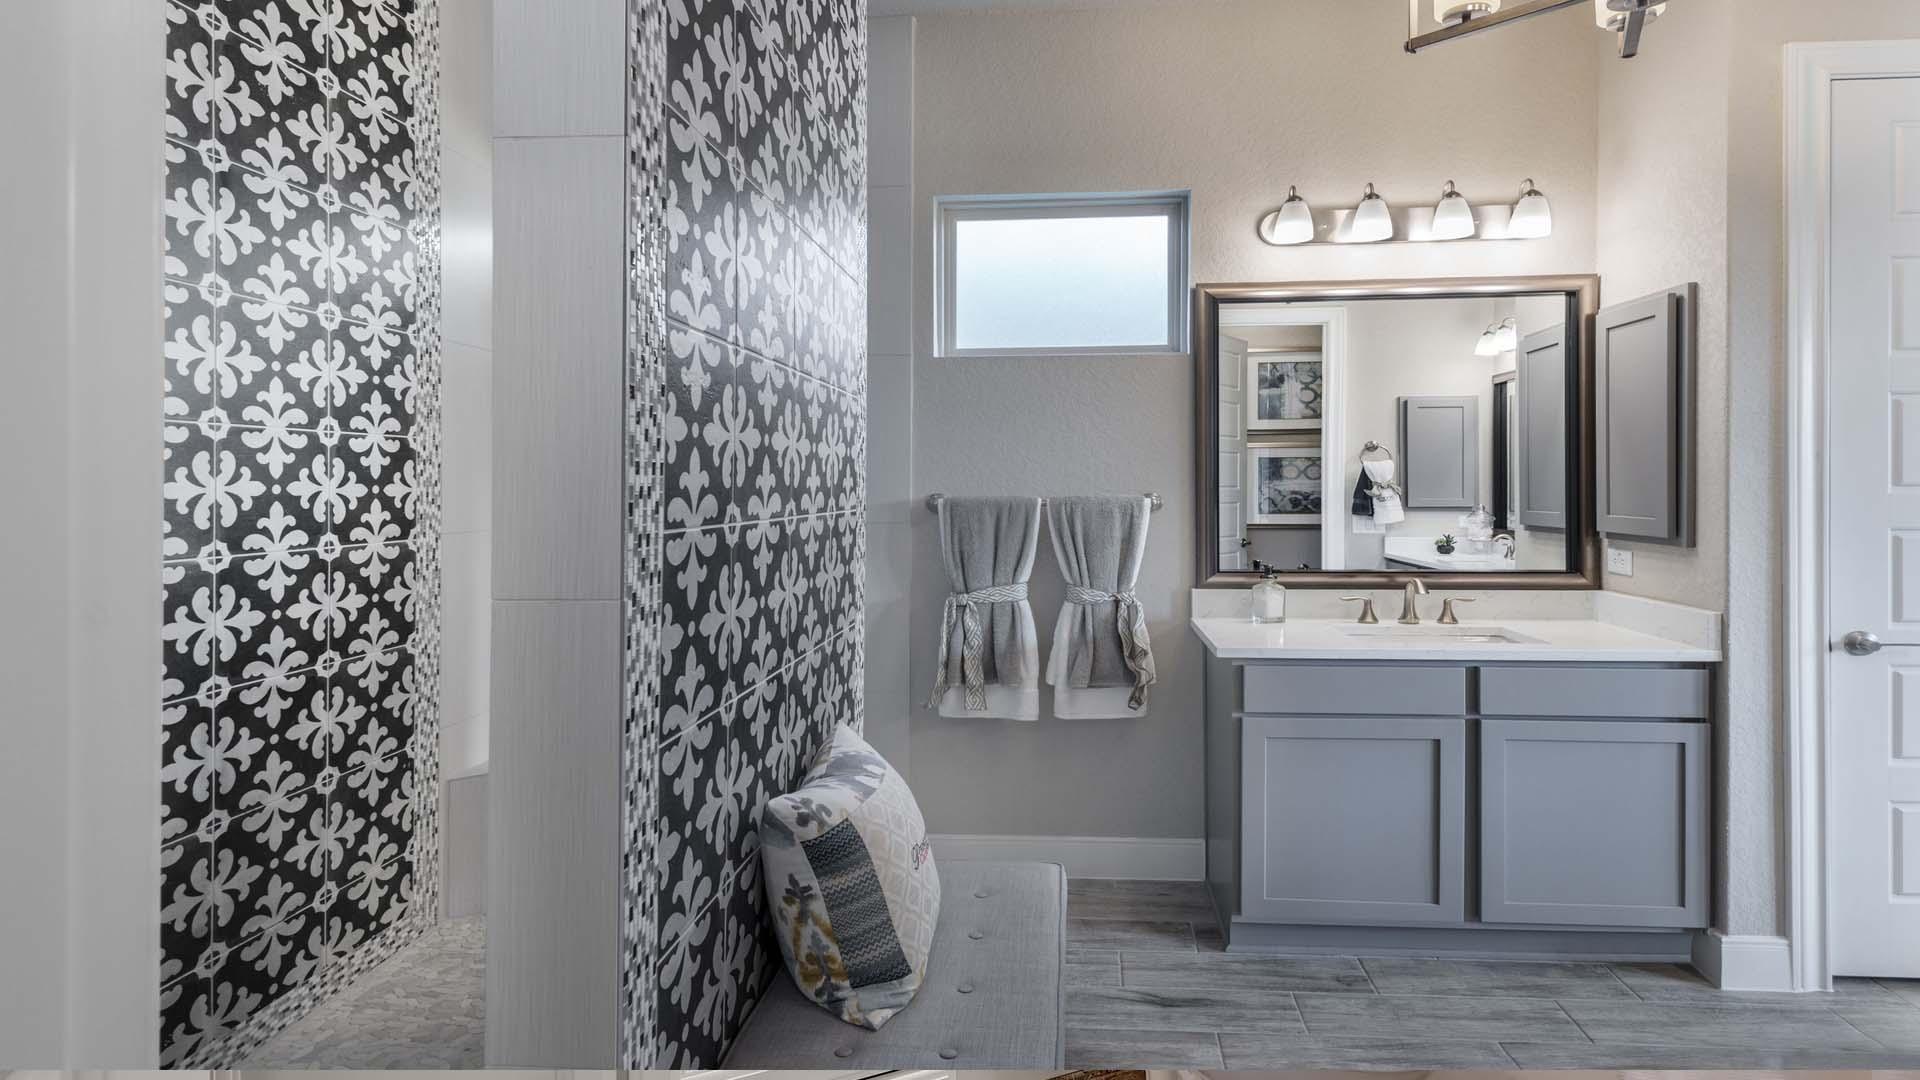 gray vanity cabinets, white quartz vanity top, framed vanity mirror, gray elongated tile floor, eclectic tile accent wall in bathroom, built-in bench seating in bath, ceiling mounted shower head, walk thru shower design, recessed medicine cabinet, chandelier in bathroom